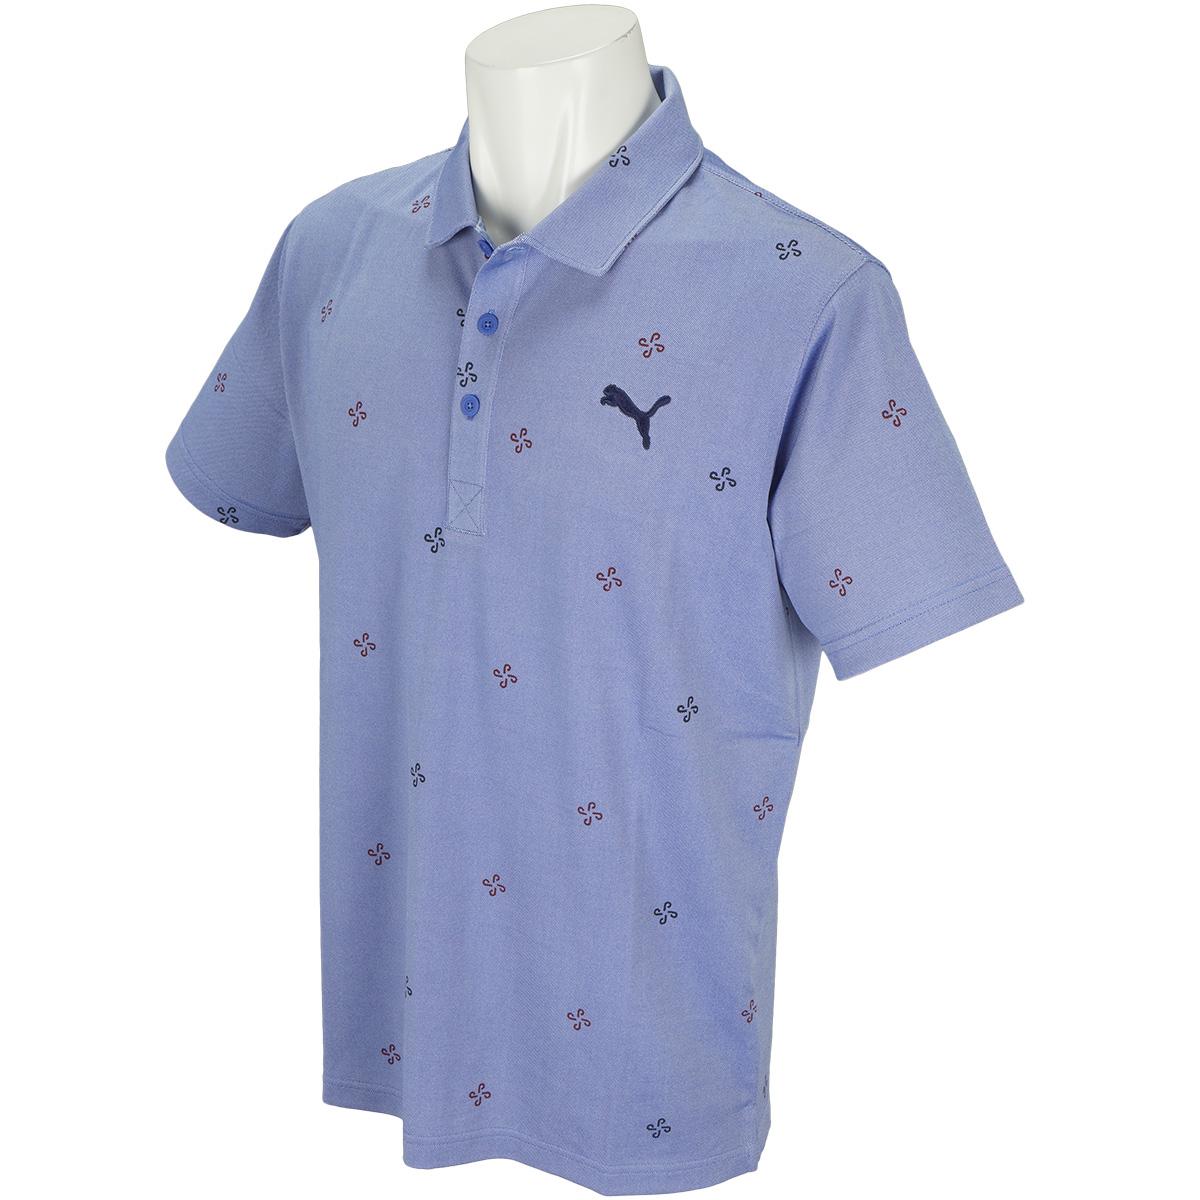 GDO限定 ディッシー 半袖ポロシャツ